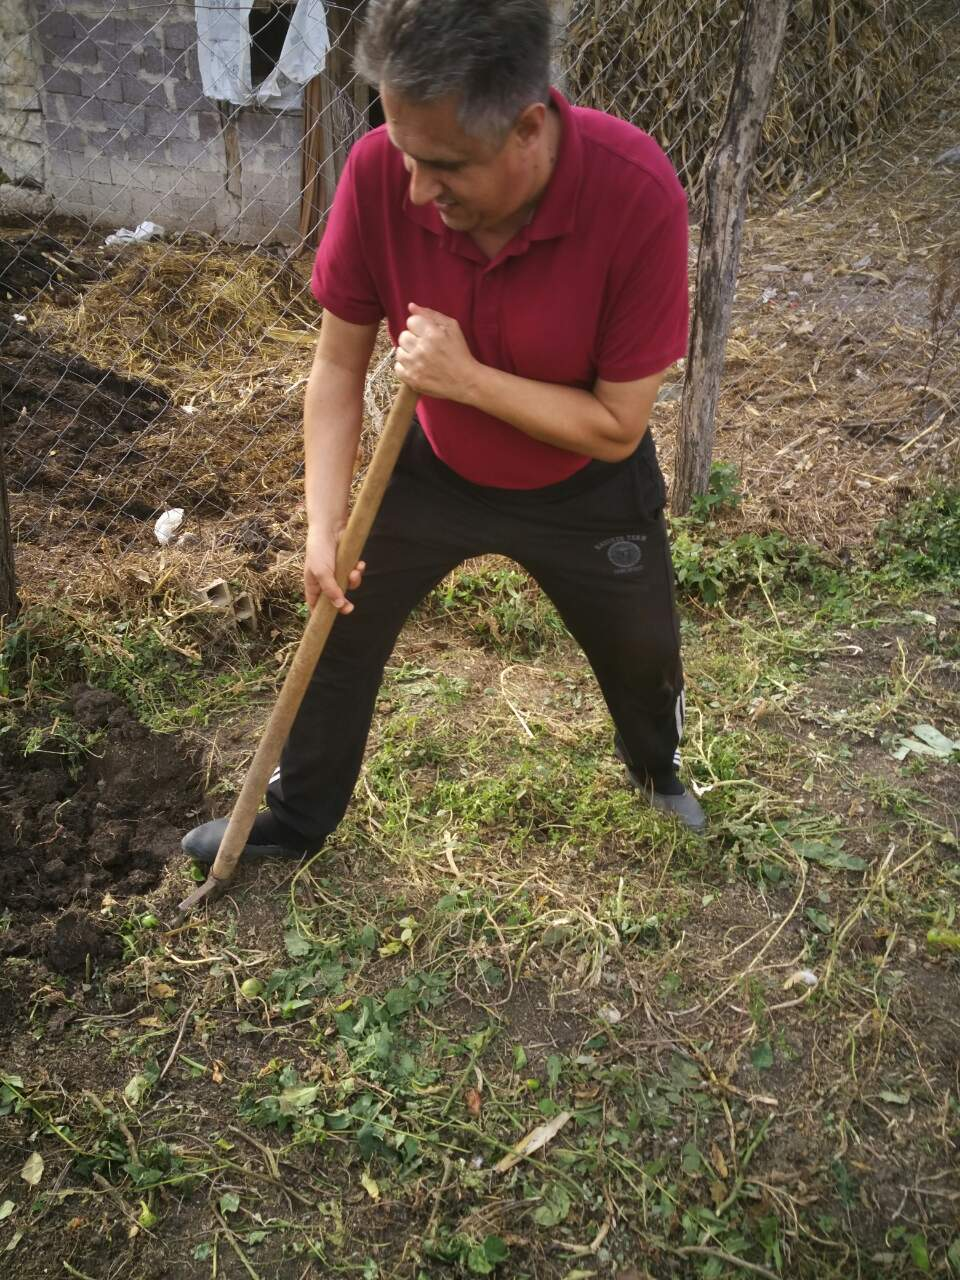 Narodni poslanik Milija Miletić rilja na svom imanju